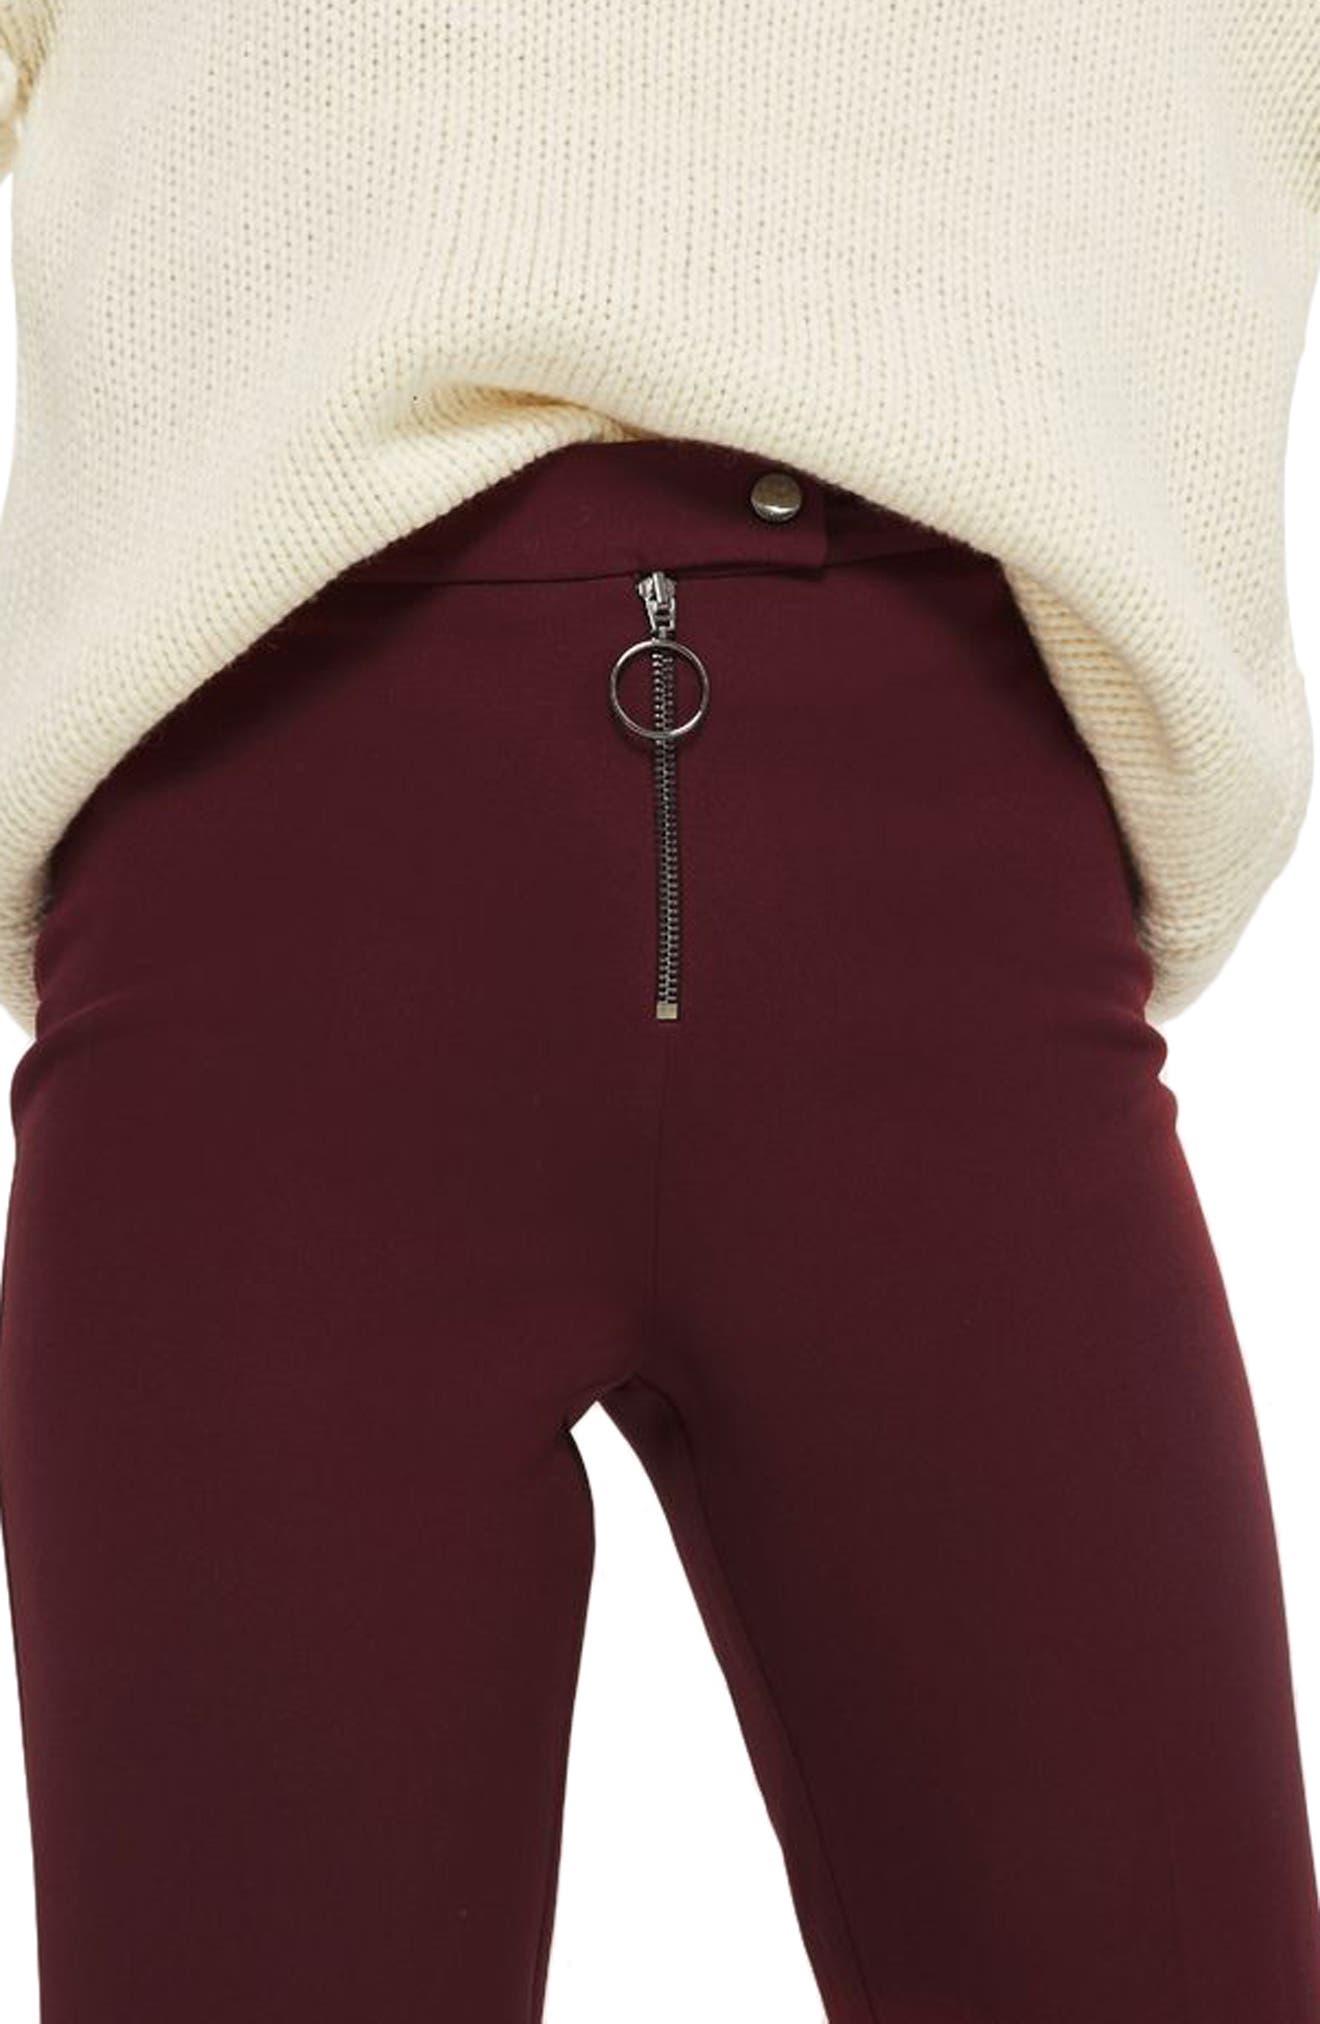 Exposed Zip Kick Flare Pants,                             Main thumbnail 1, color,                             930